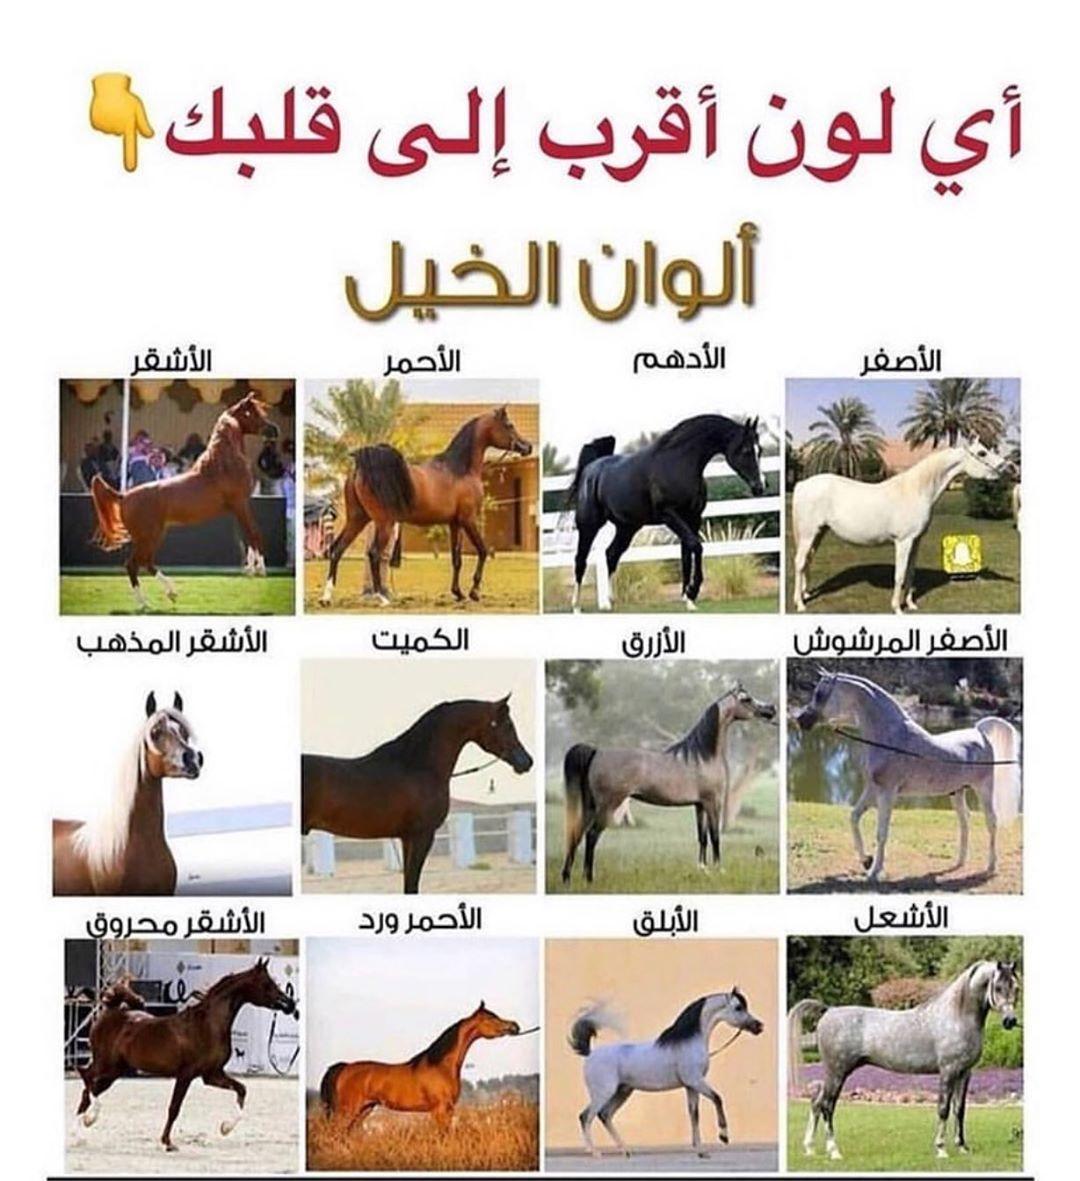 الأشقر و الازرق Follow Us Stud386 Like The Post Mention Your Friend الاعل Beautiful Horses Animals Horses